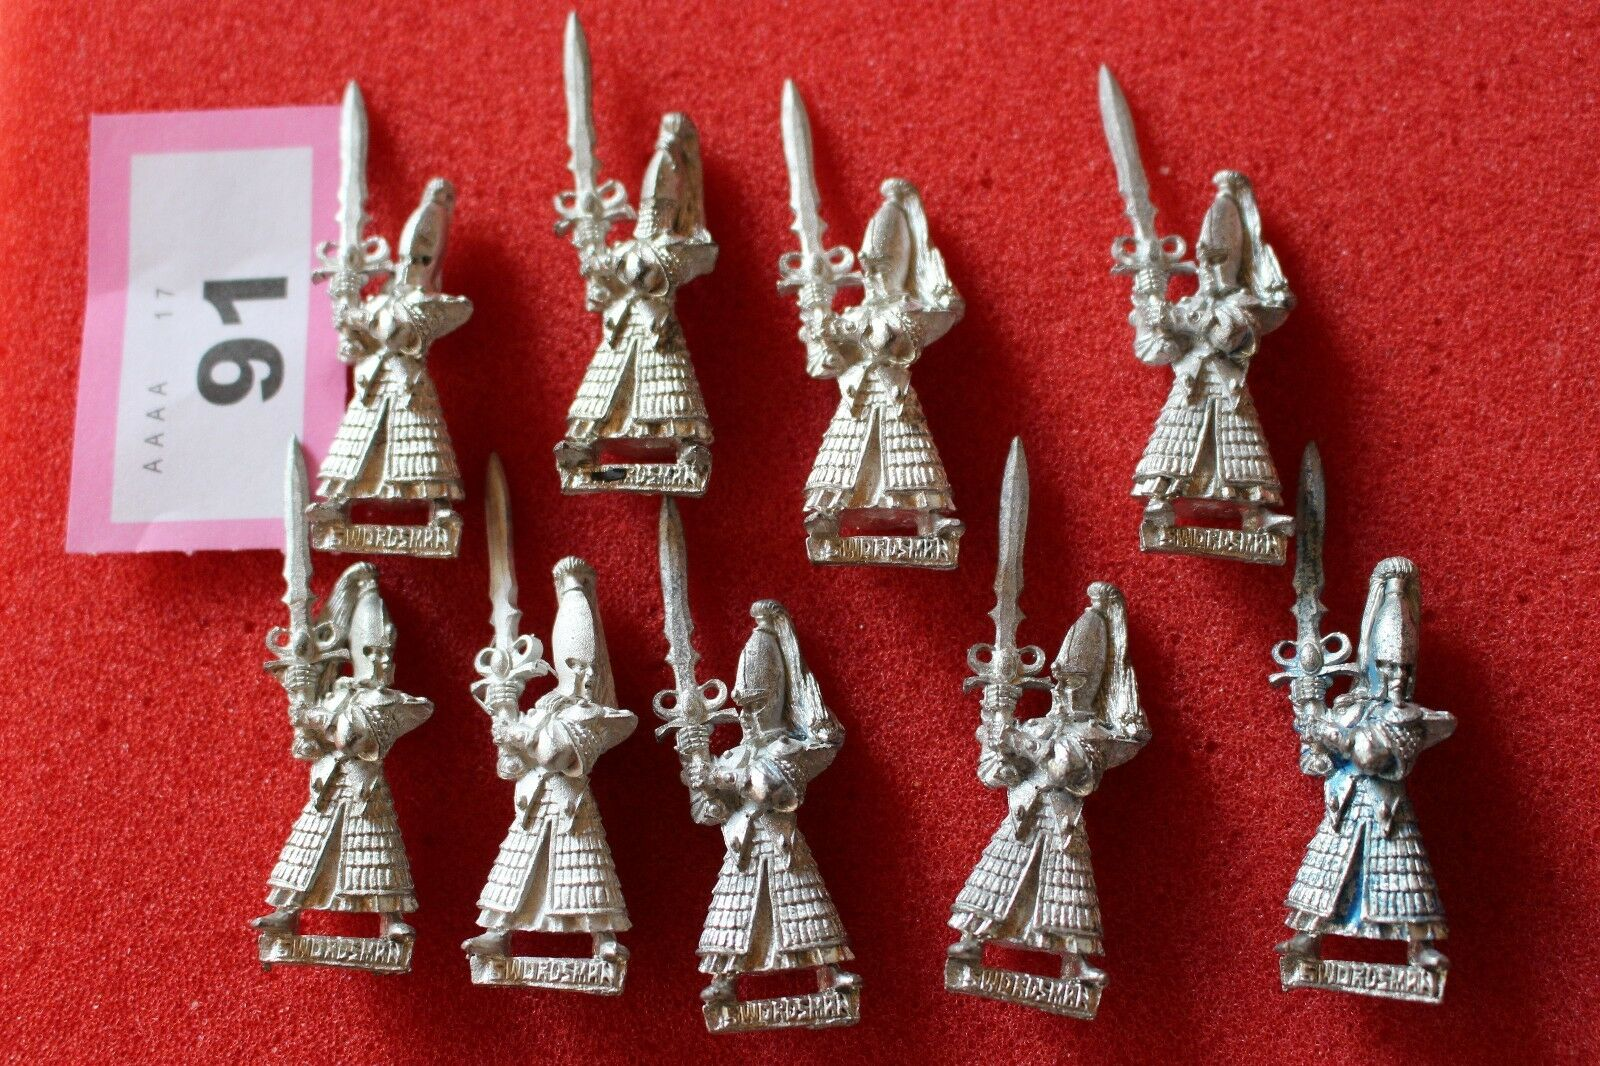 Games Workshop Warhammer High Elf Swordmasters Warriors Regiment Miniatures Army